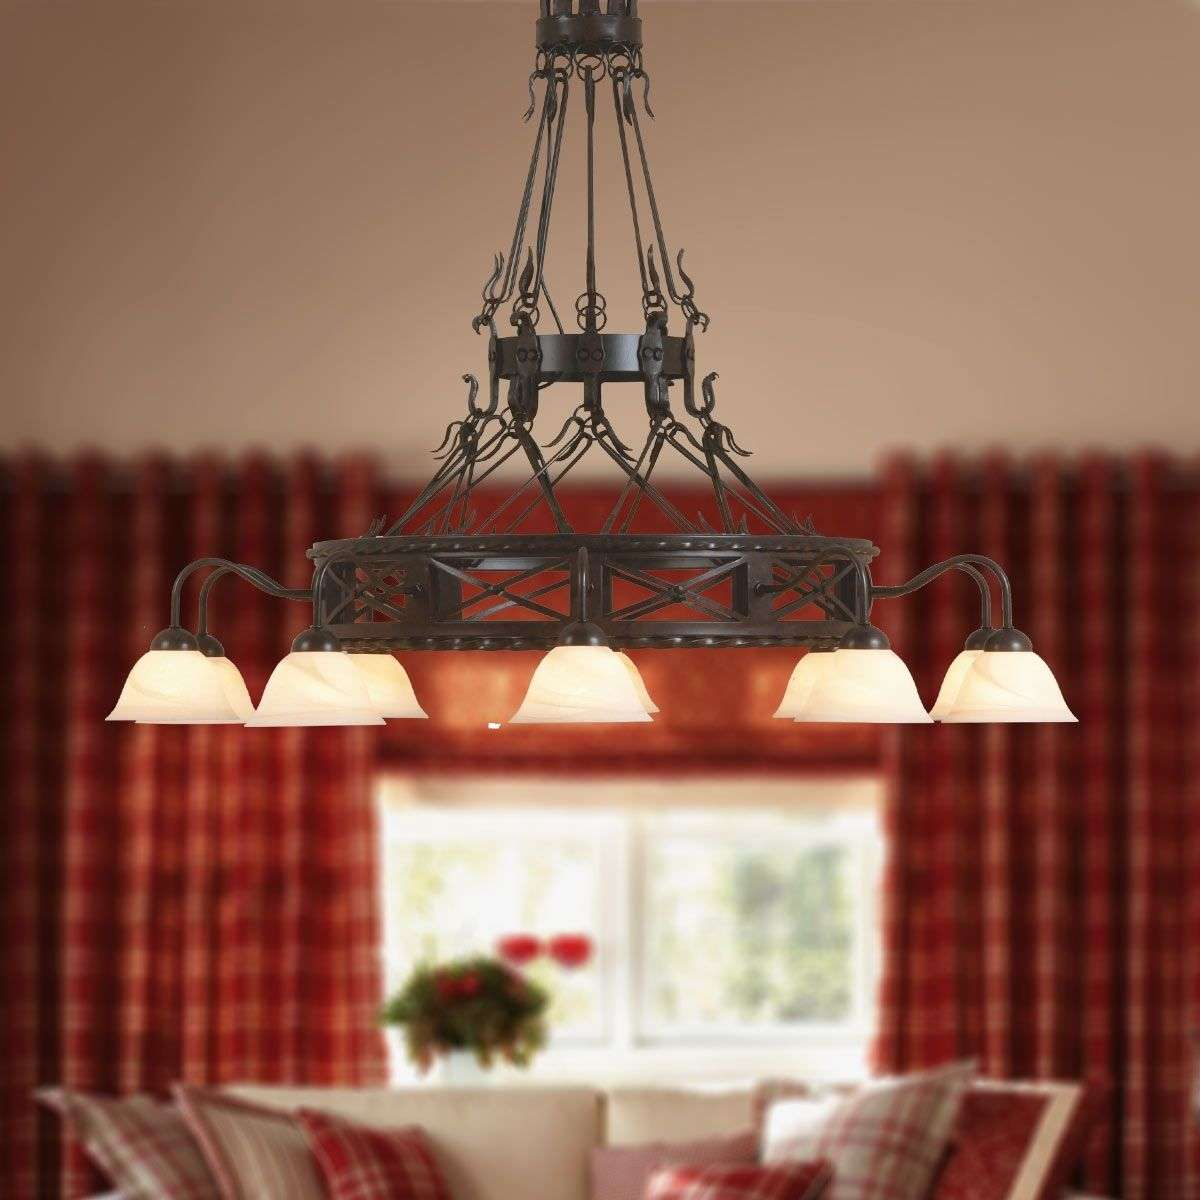 Pusta handmade chandelier ten bulb lights pusta handmade chandelier ten bulb 6528161 31 aloadofball Gallery